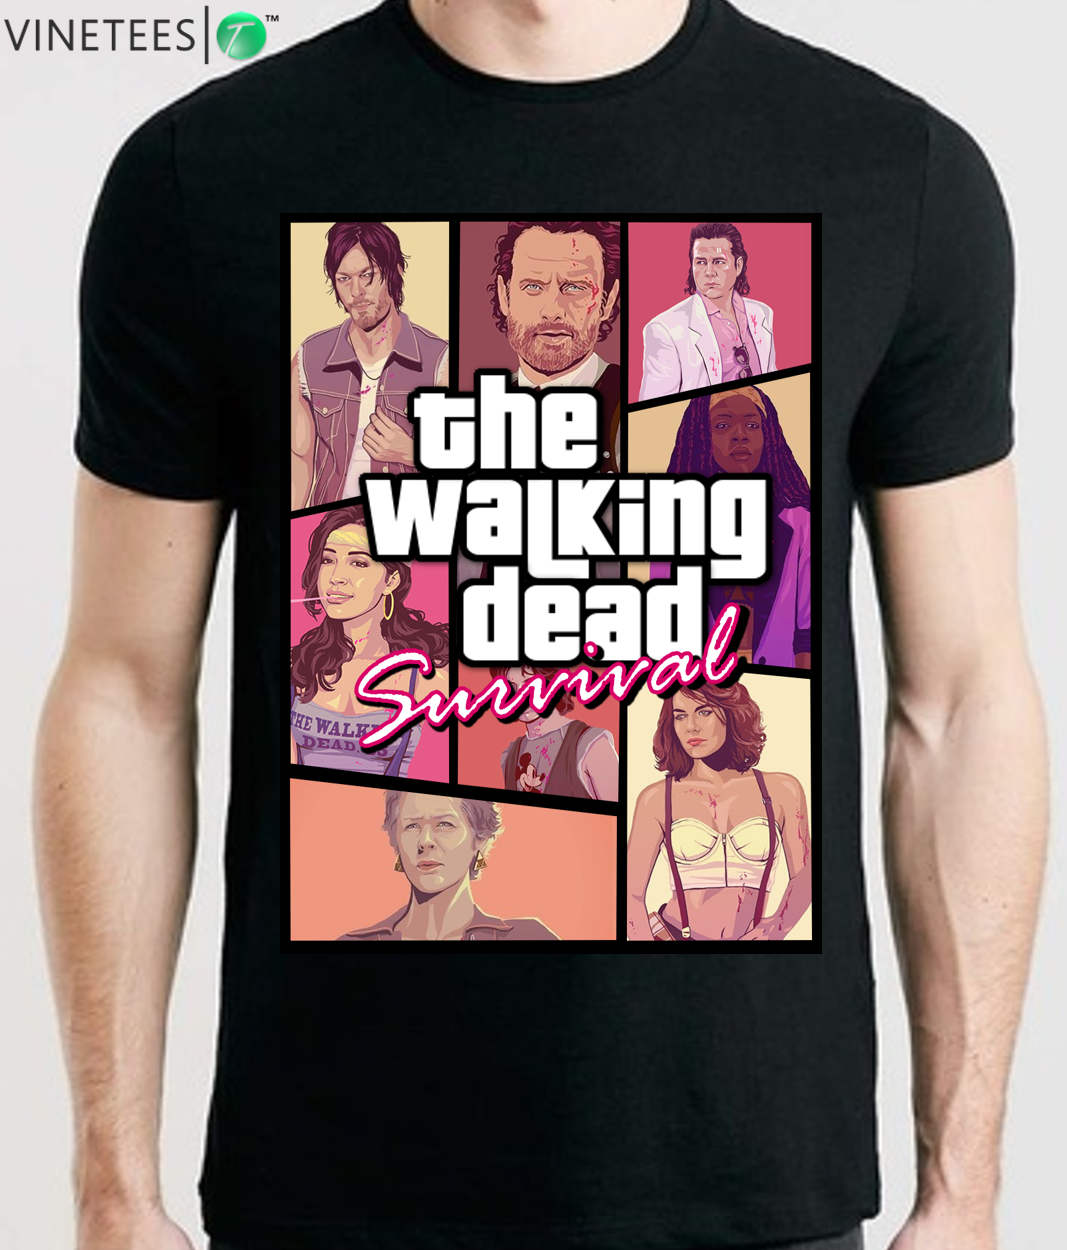 THE WALKING DEAD TWD SEASON 9 RICK GRIMES DARYL DIXON NEEGAN MAGGIE MENS T Shirt  Cool Casual Pride T Shirt Men Unisex New